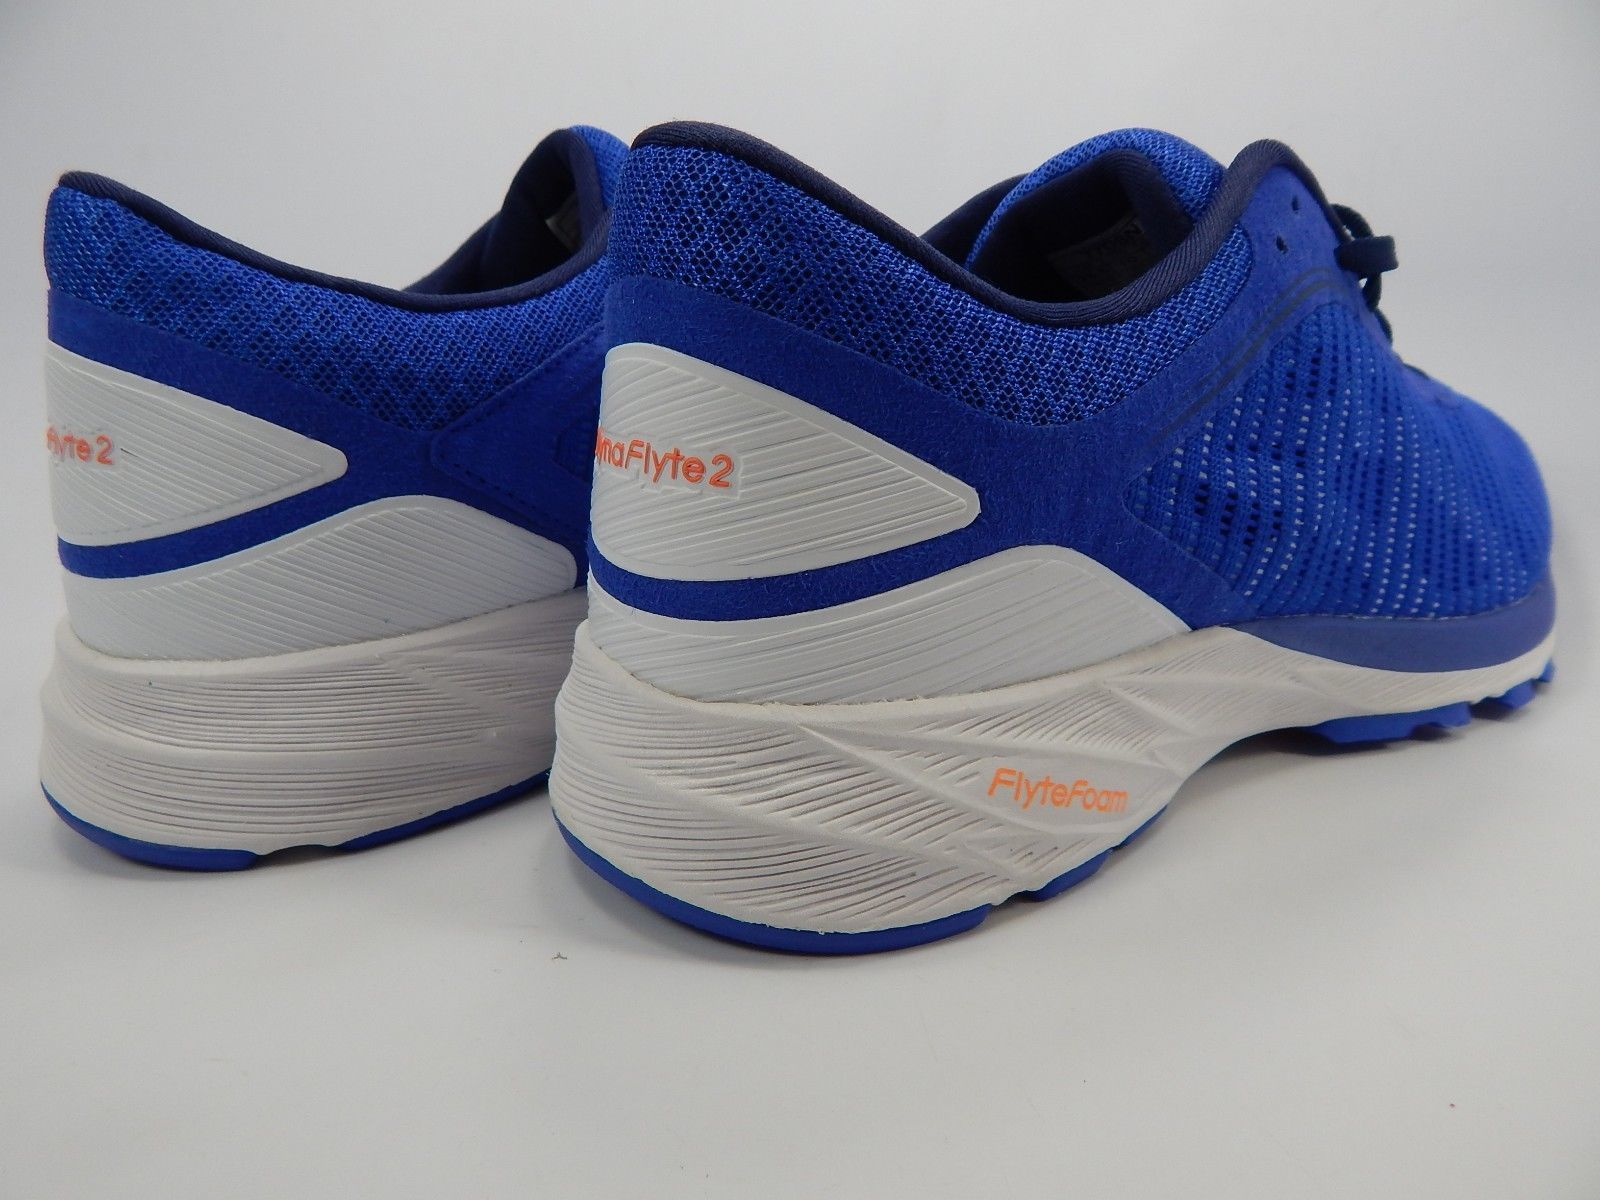 Asics Dynaflyte 2 Size 10 M (B) EU 42 Women's Running Shoes White Blue T7D5N